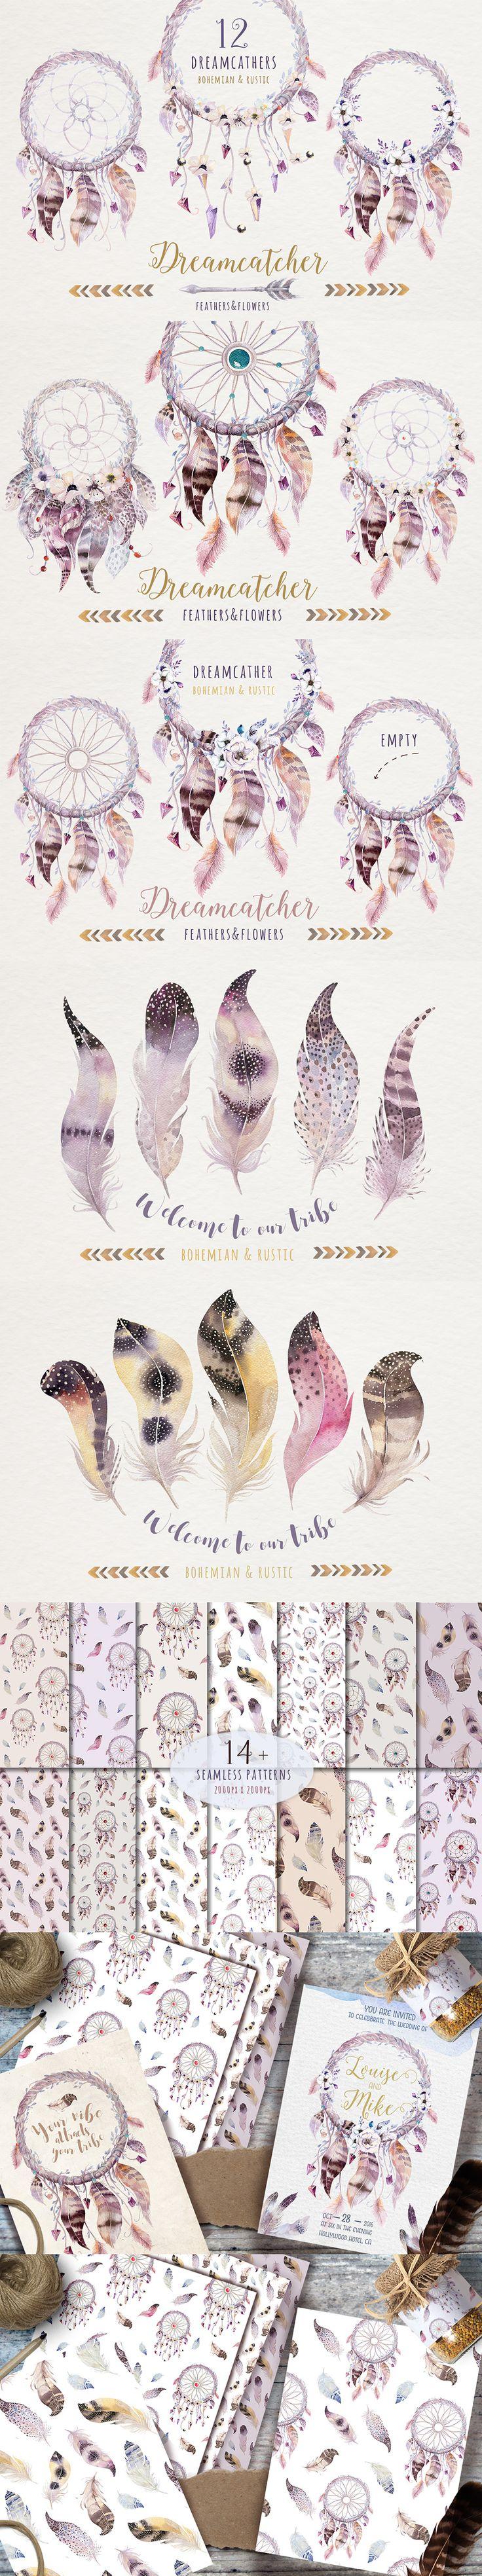 Bohemian Watercolor Dreamcatchers II » Ooh, loving these feathers. so darn pretty!